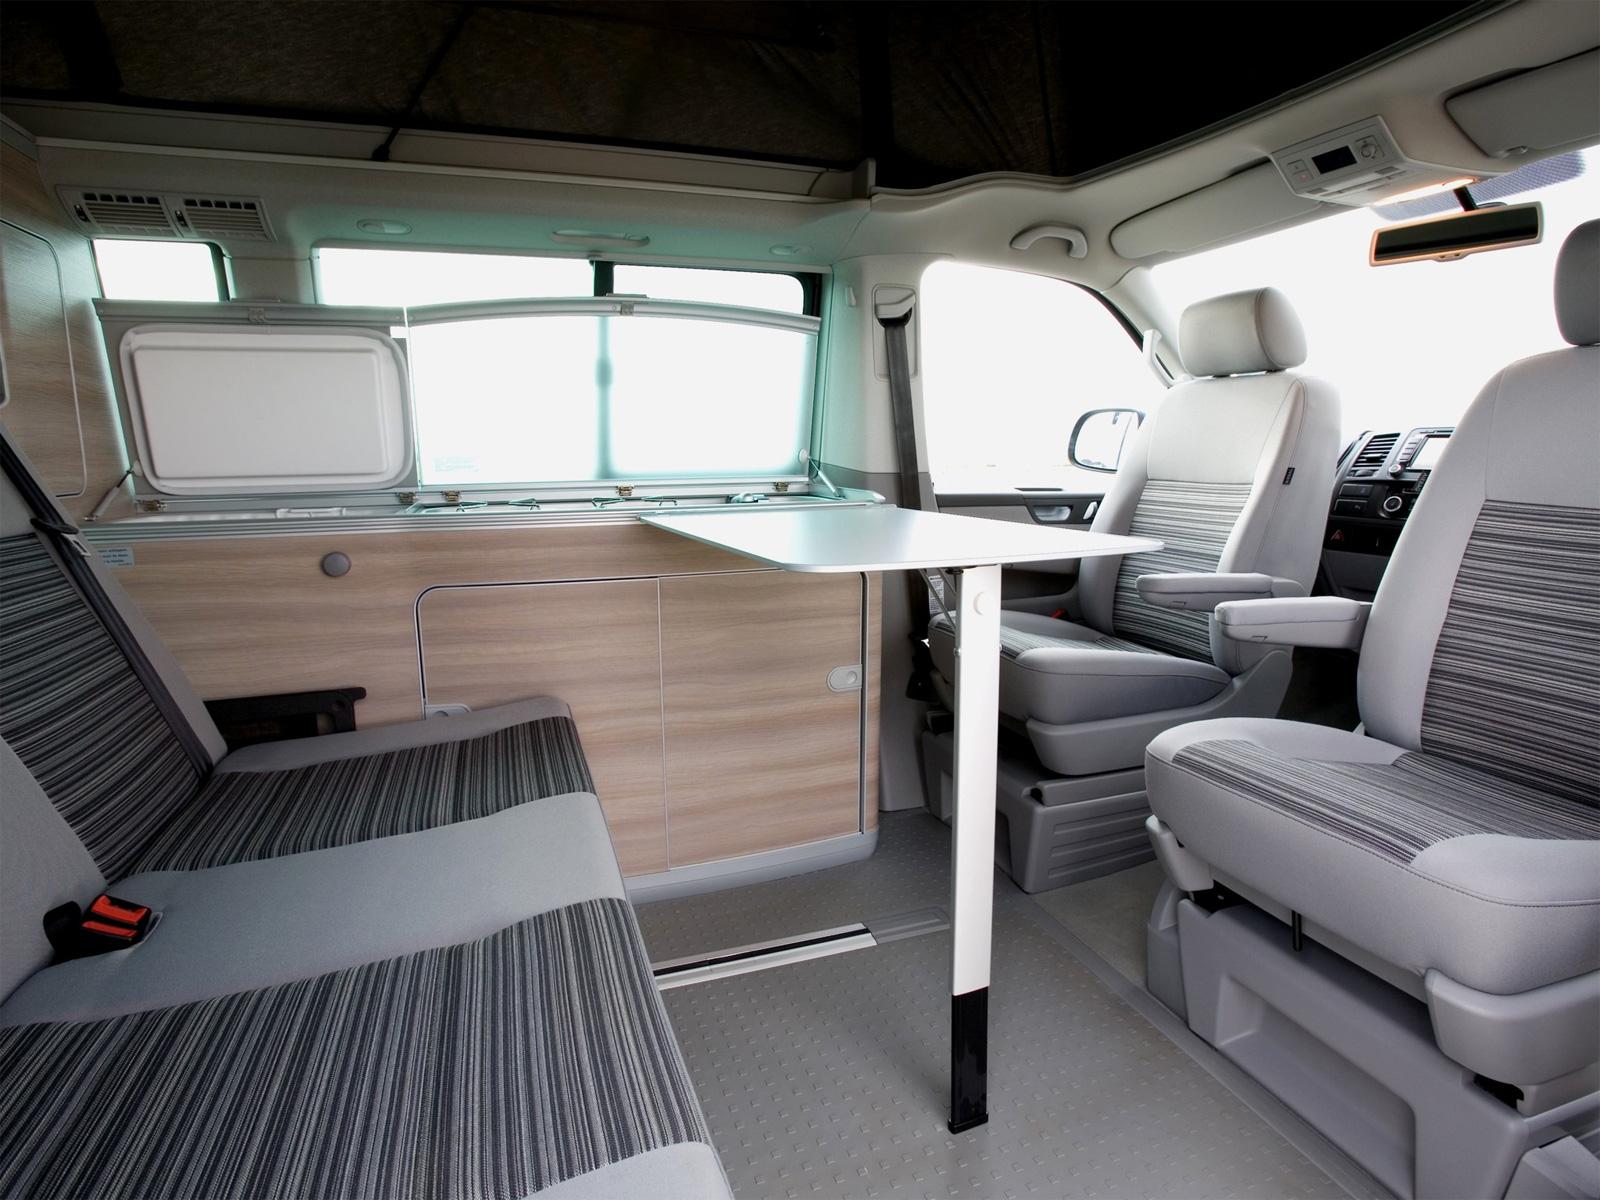 volkswagen california t5 2003 2015. Black Bedroom Furniture Sets. Home Design Ideas